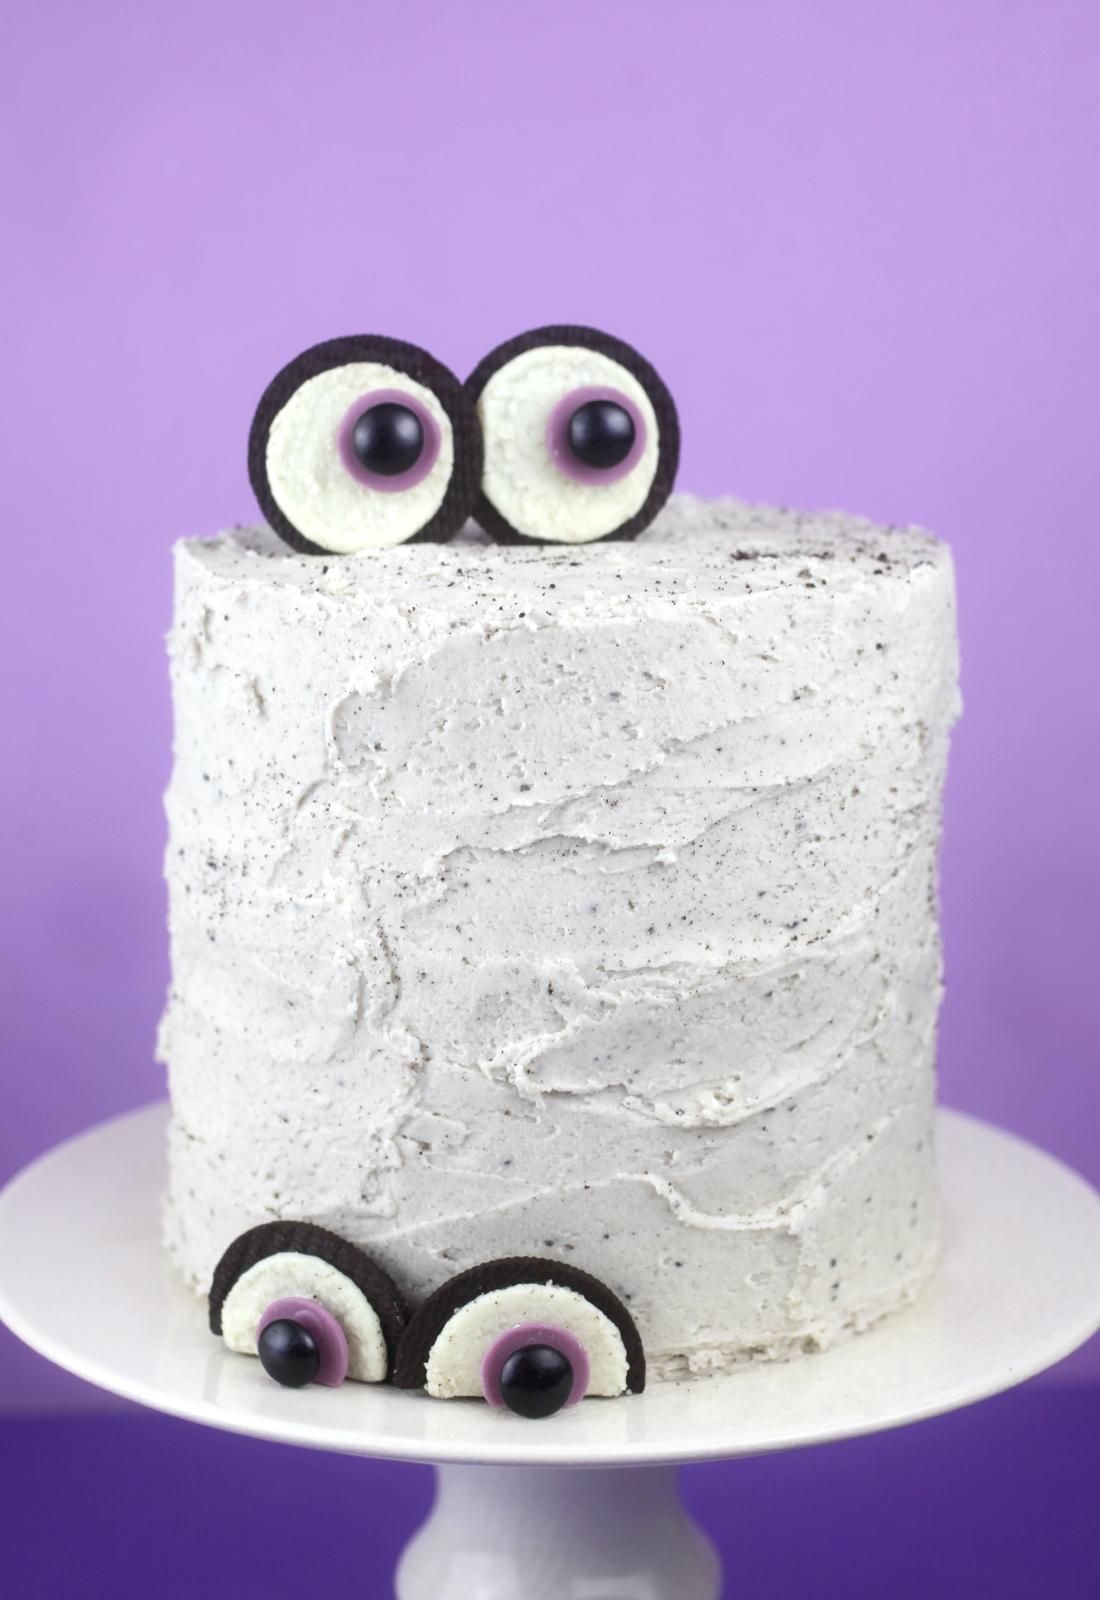 Oreo Eyeball Cake